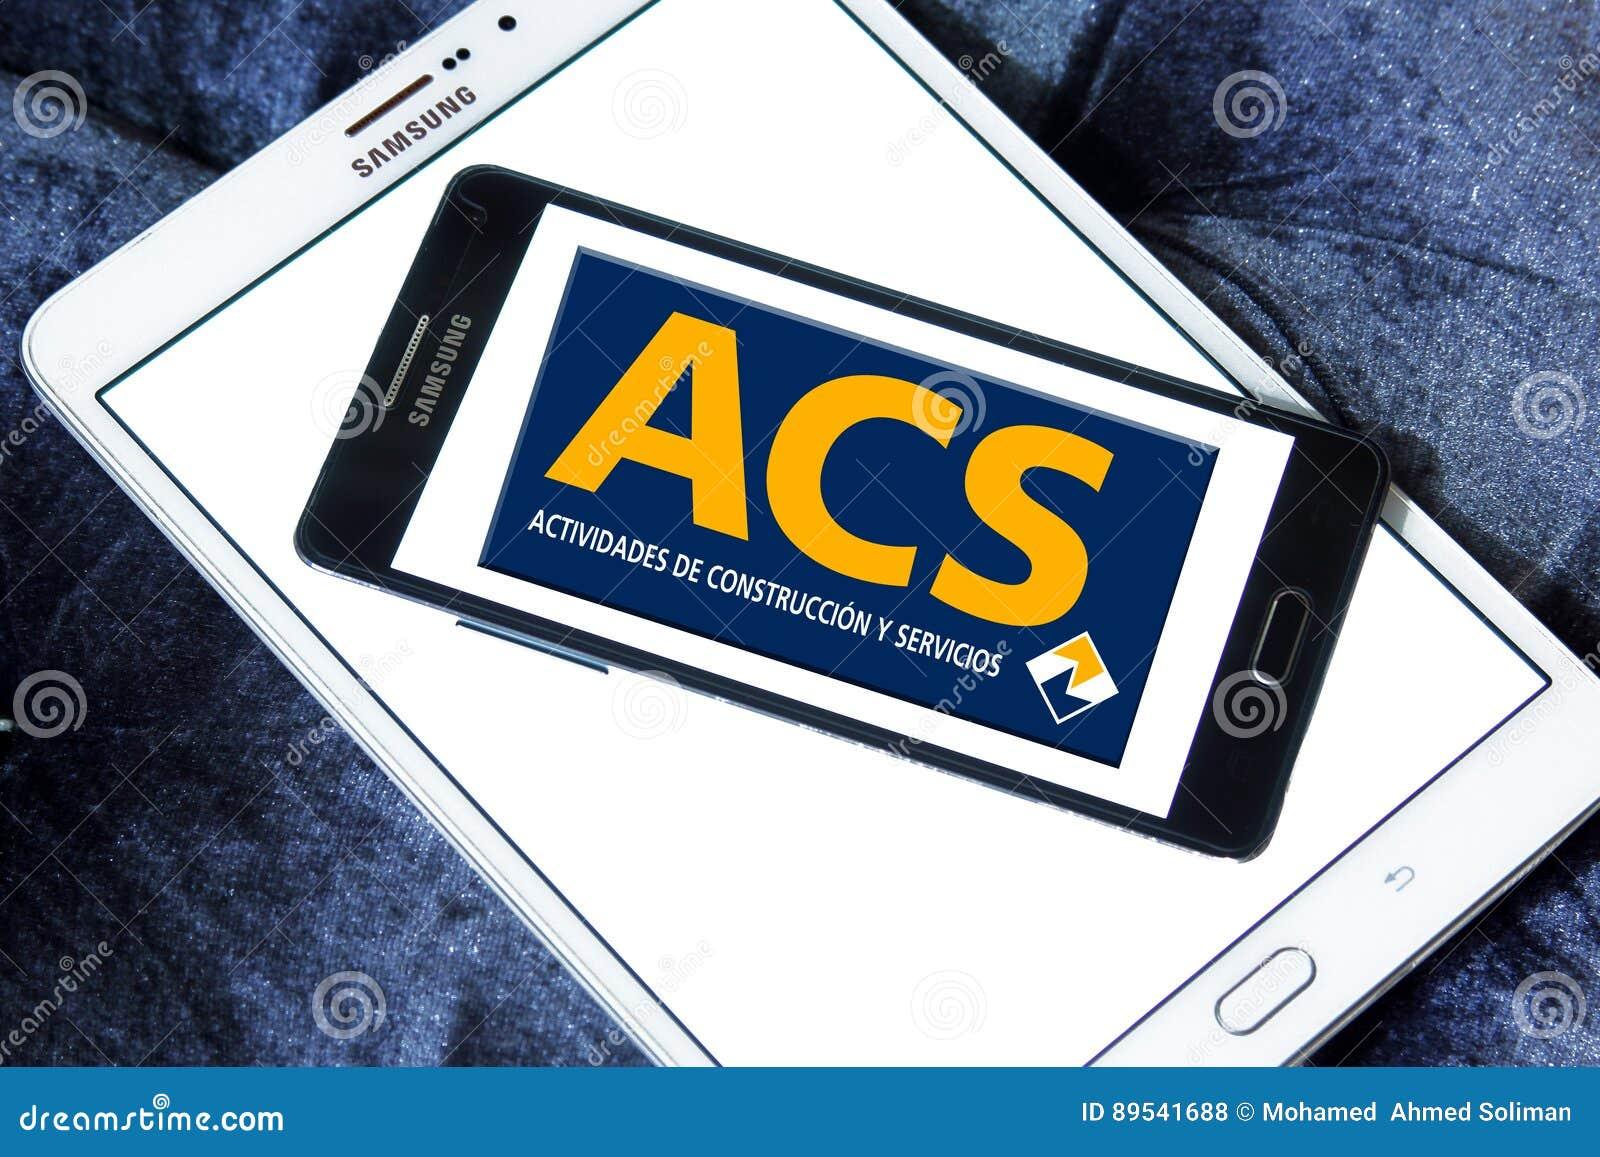 Acs Construction Group Logo Editorial Stock Photo Image Of Symbols